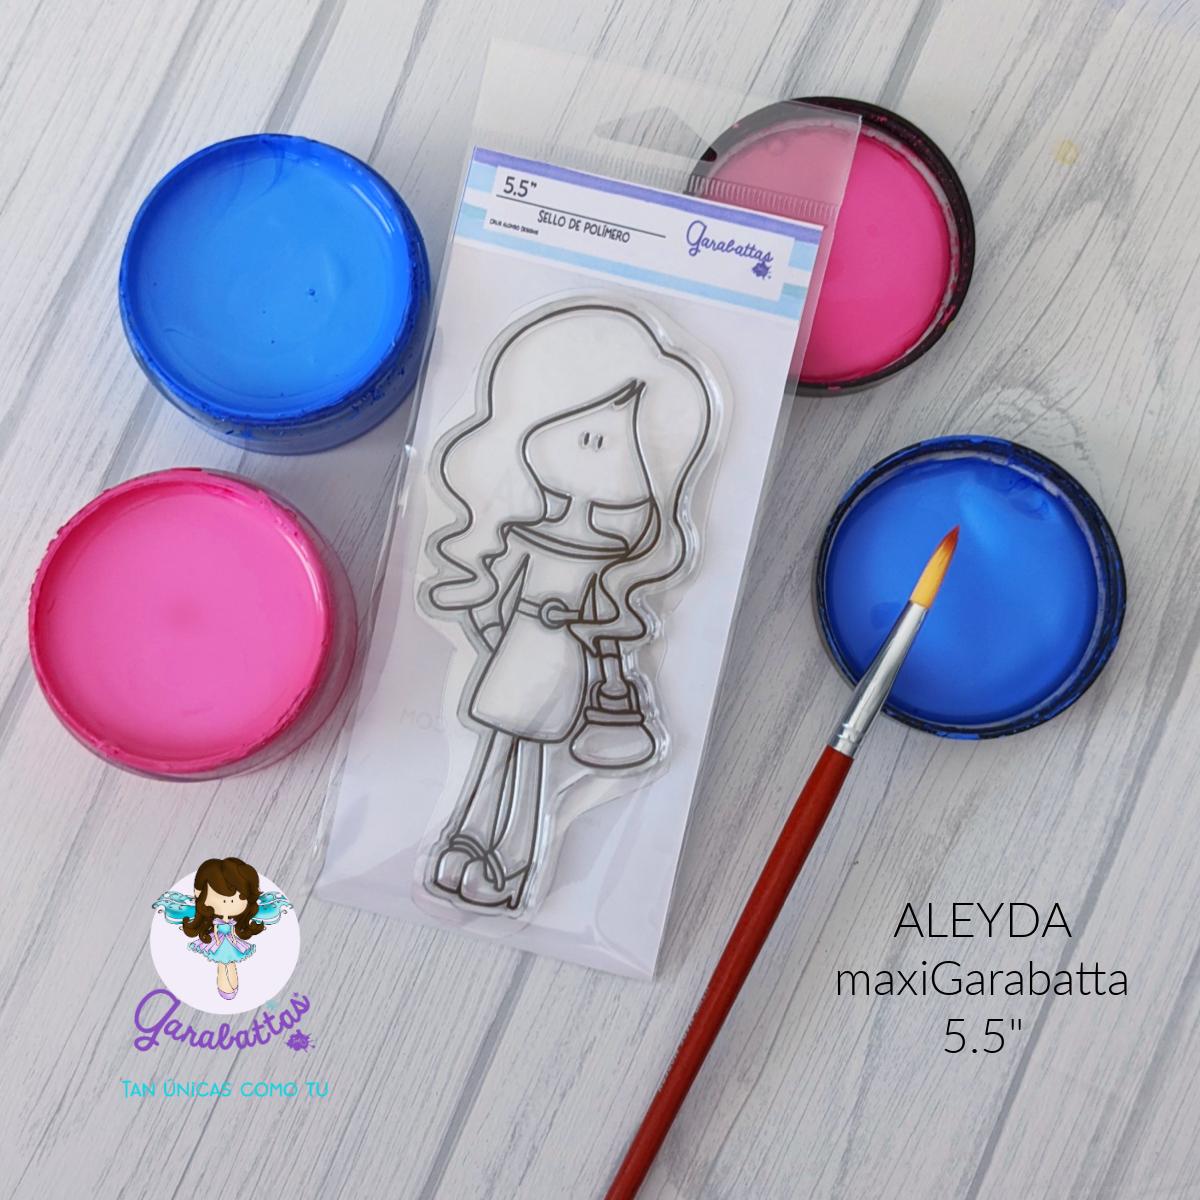 "5.5"" Stamp - Aleyda"